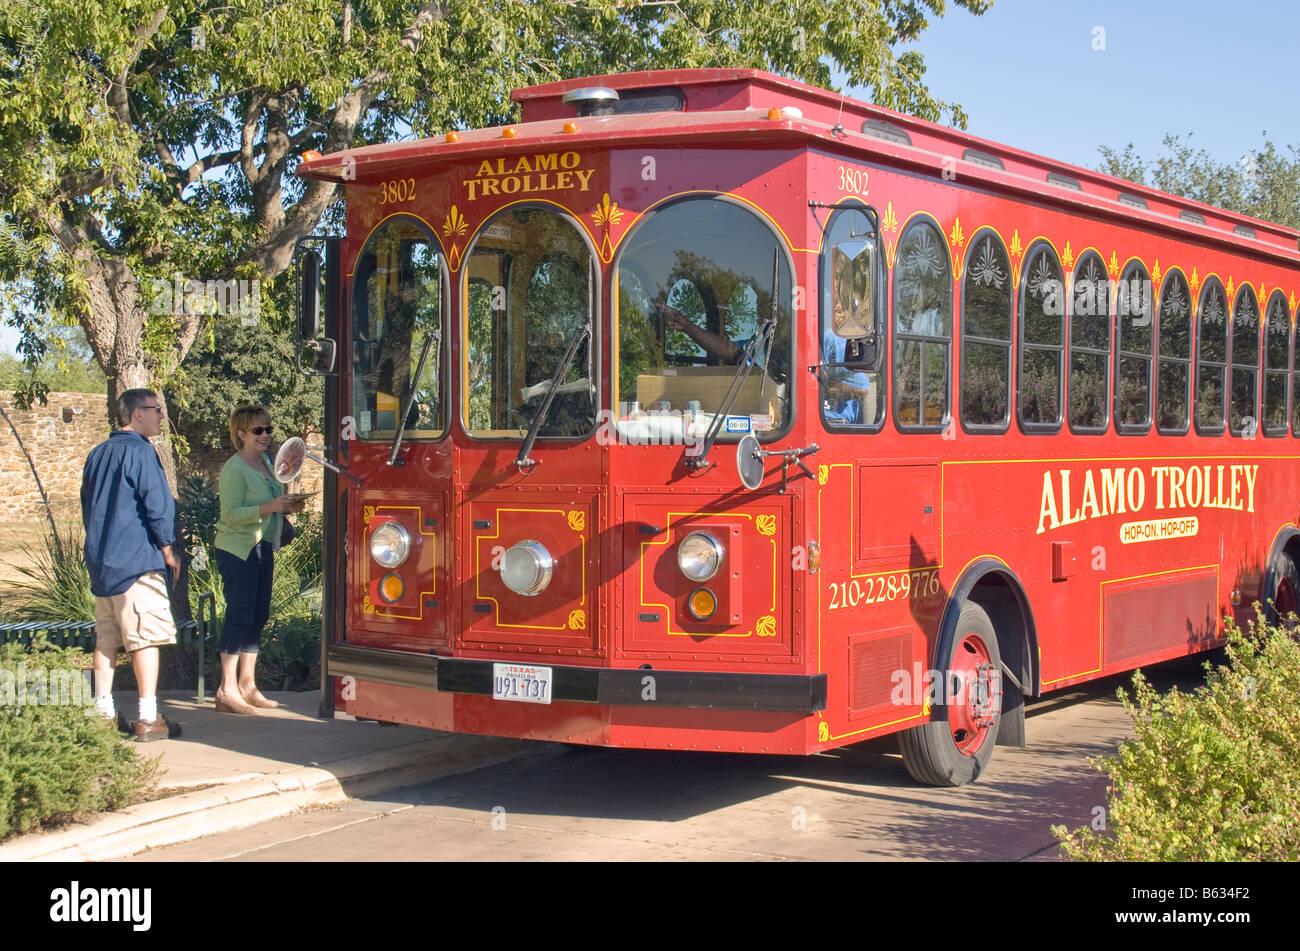 San Antonio, Alamo Trolley tour bus picking up passengers on The Mission Trail - Stock Image